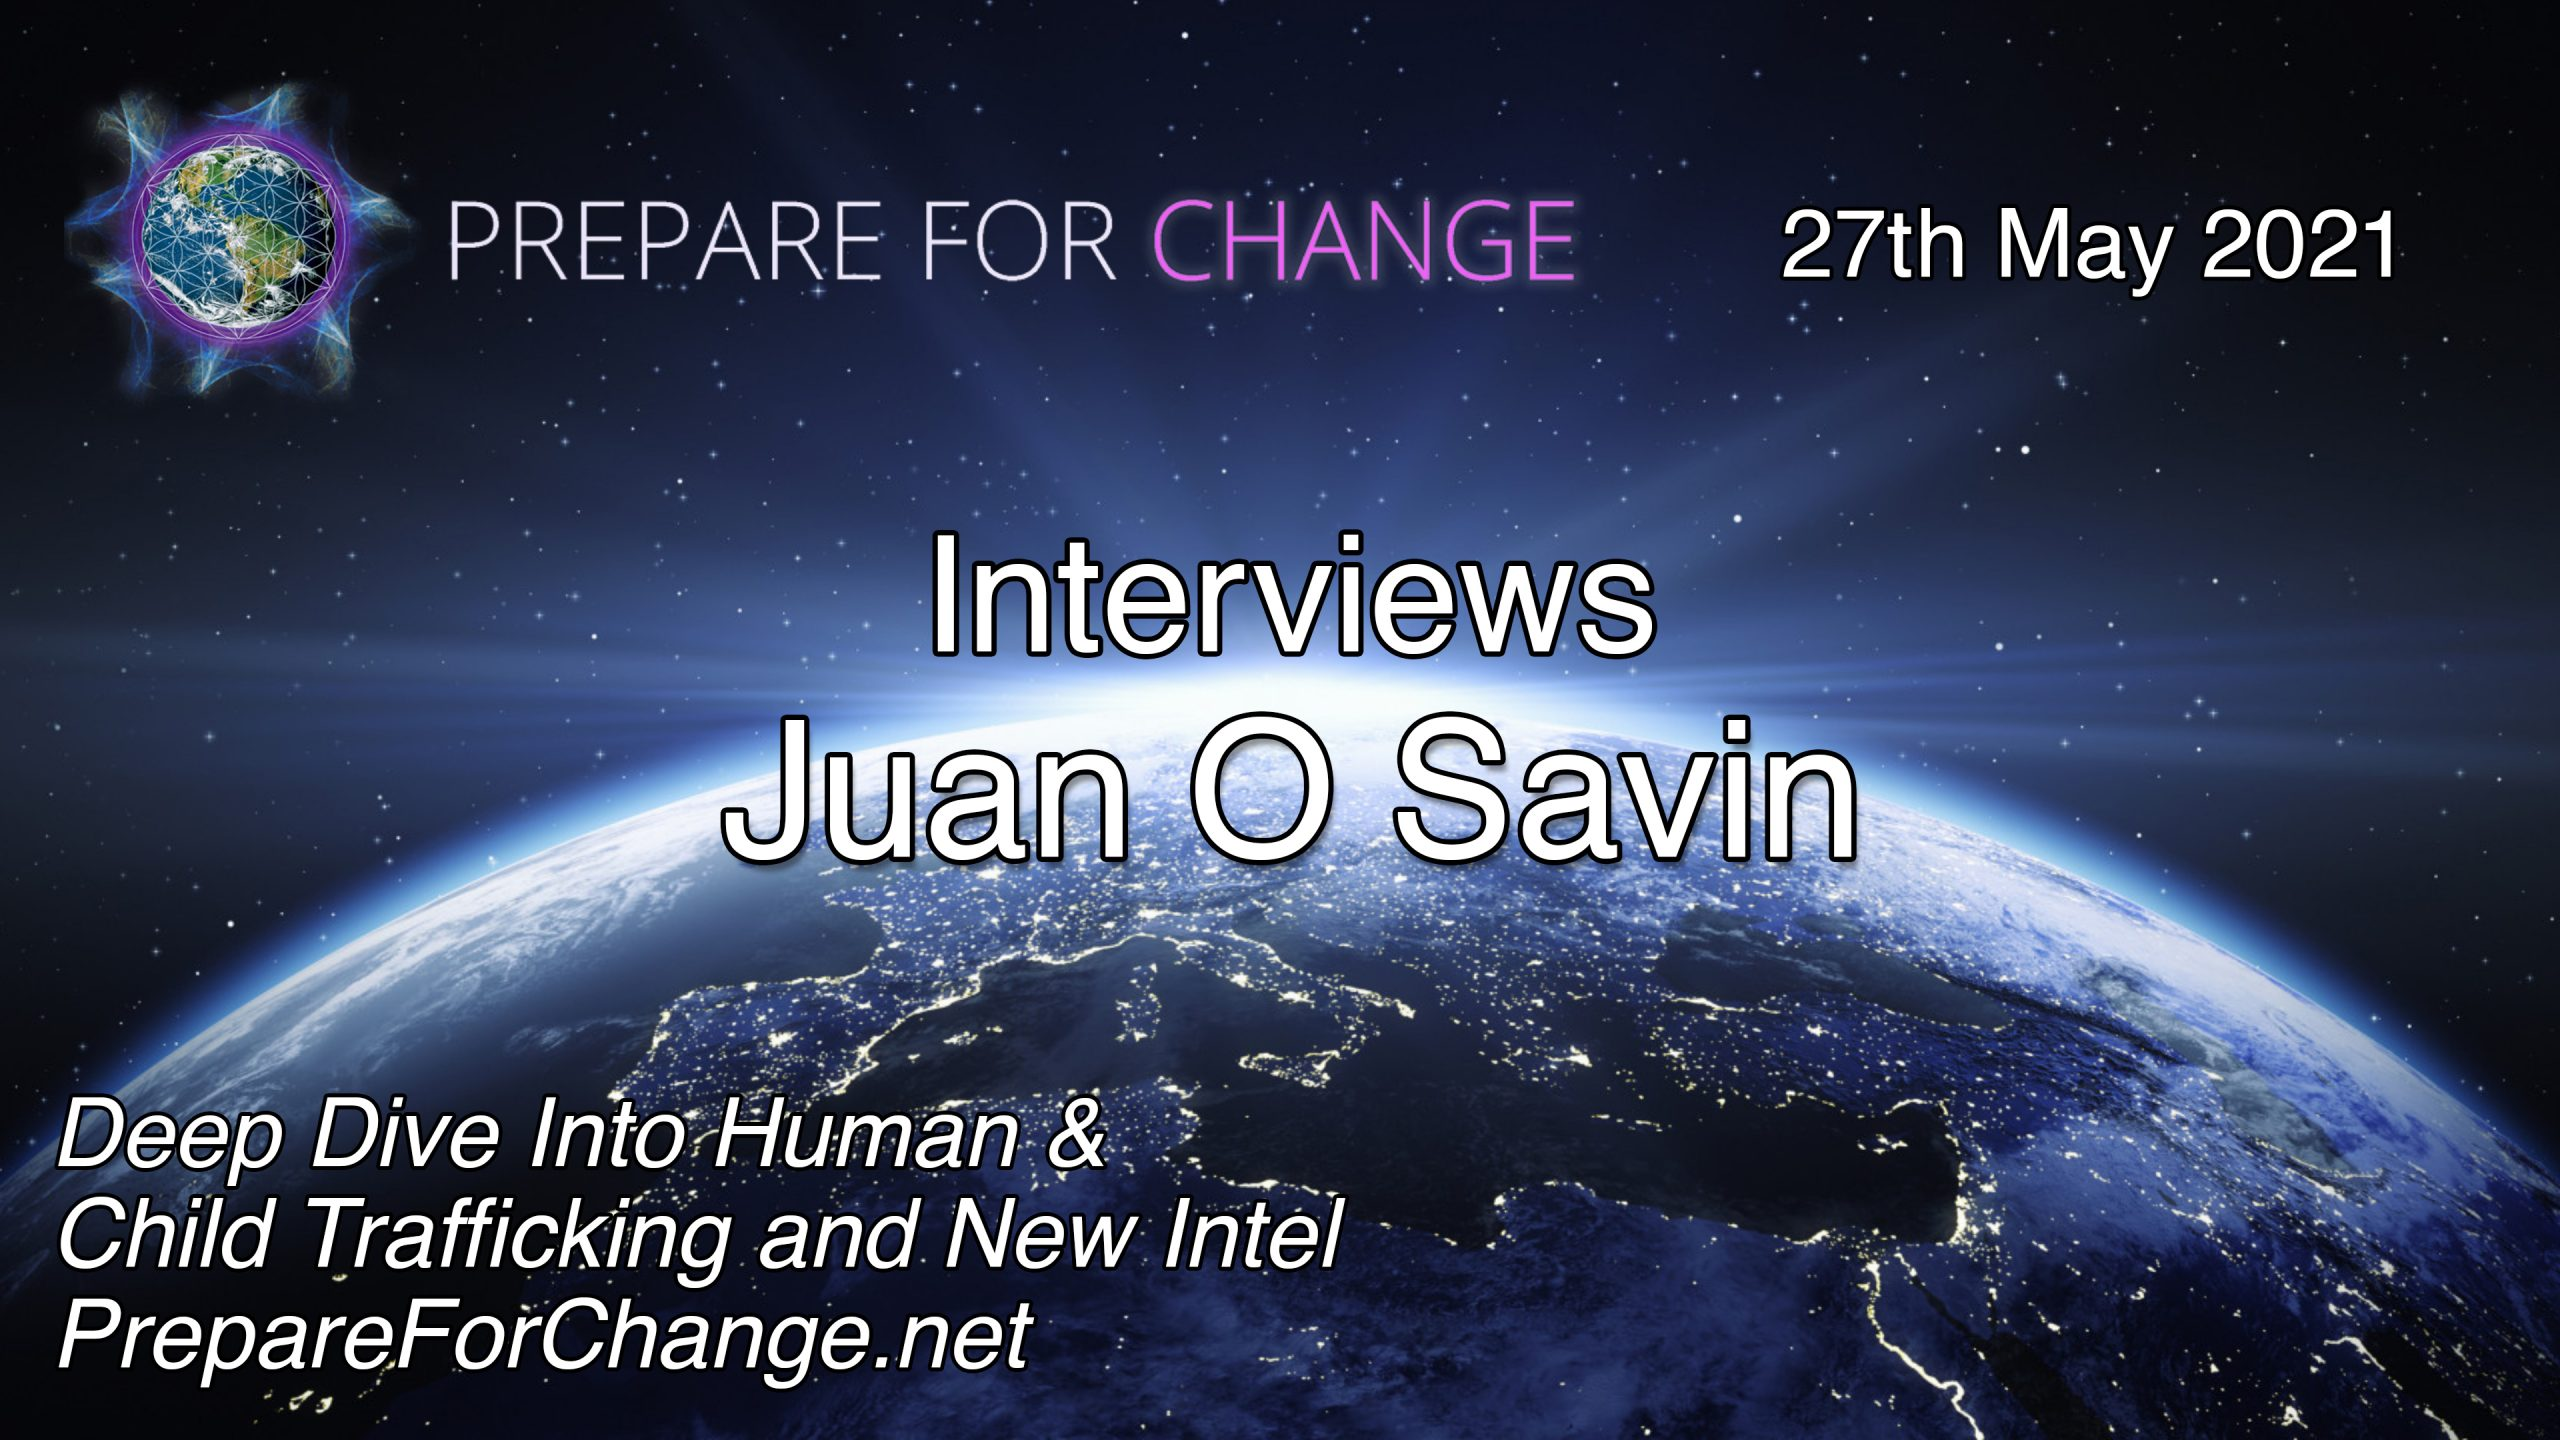 Juan07-Interview-Title-5.27.21-scaled.jpg